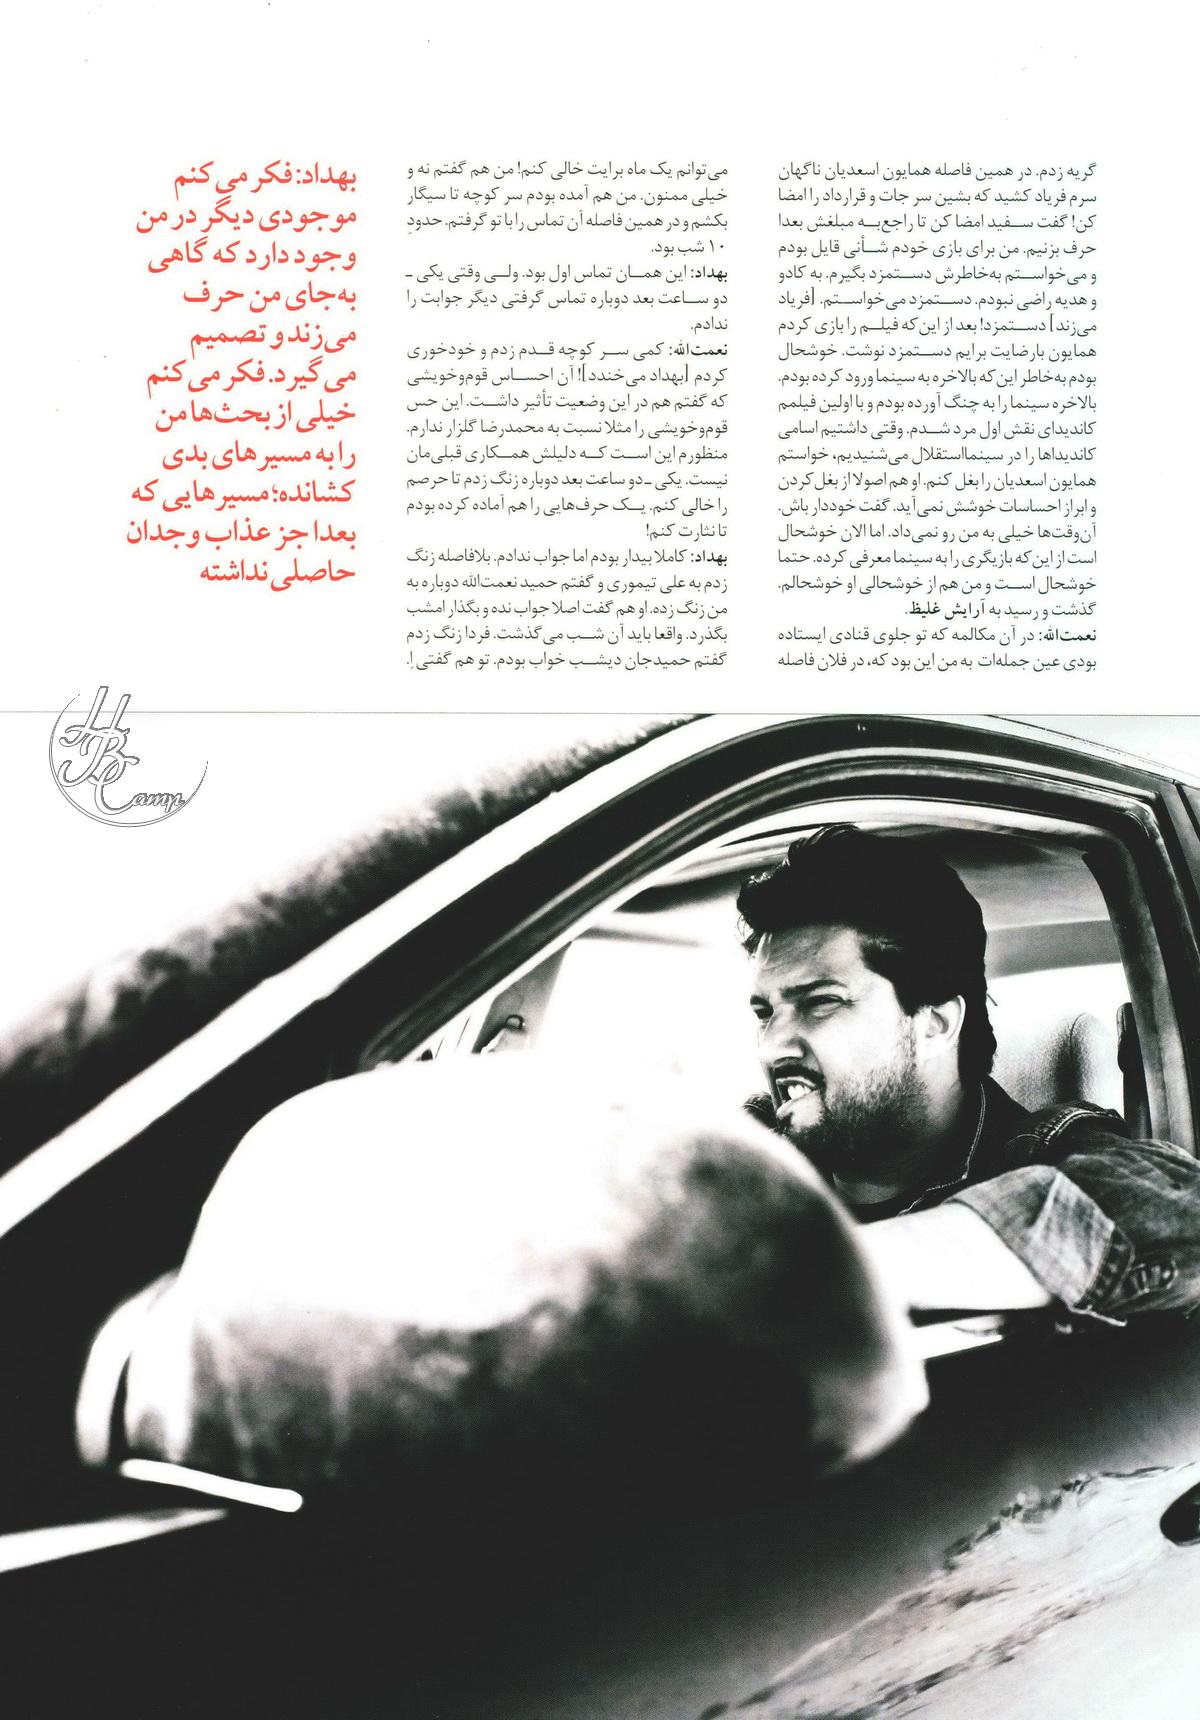 http://yotab.persiangig.com/magazin/24mag-56/04.jpg